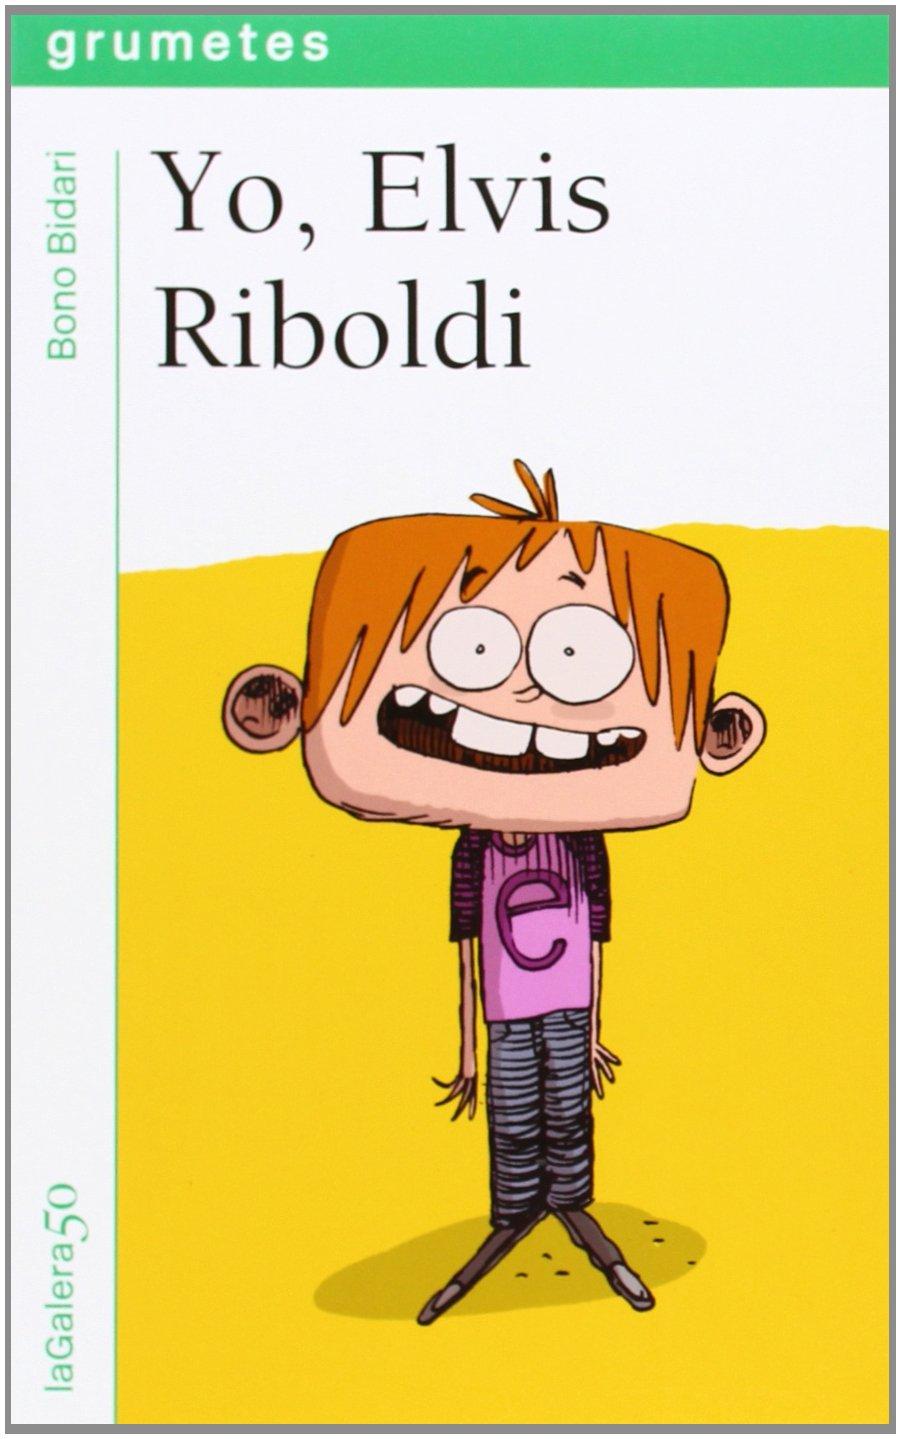 Yo, Elvis Riboldi (Spanish) Paperback – May 1, 2013